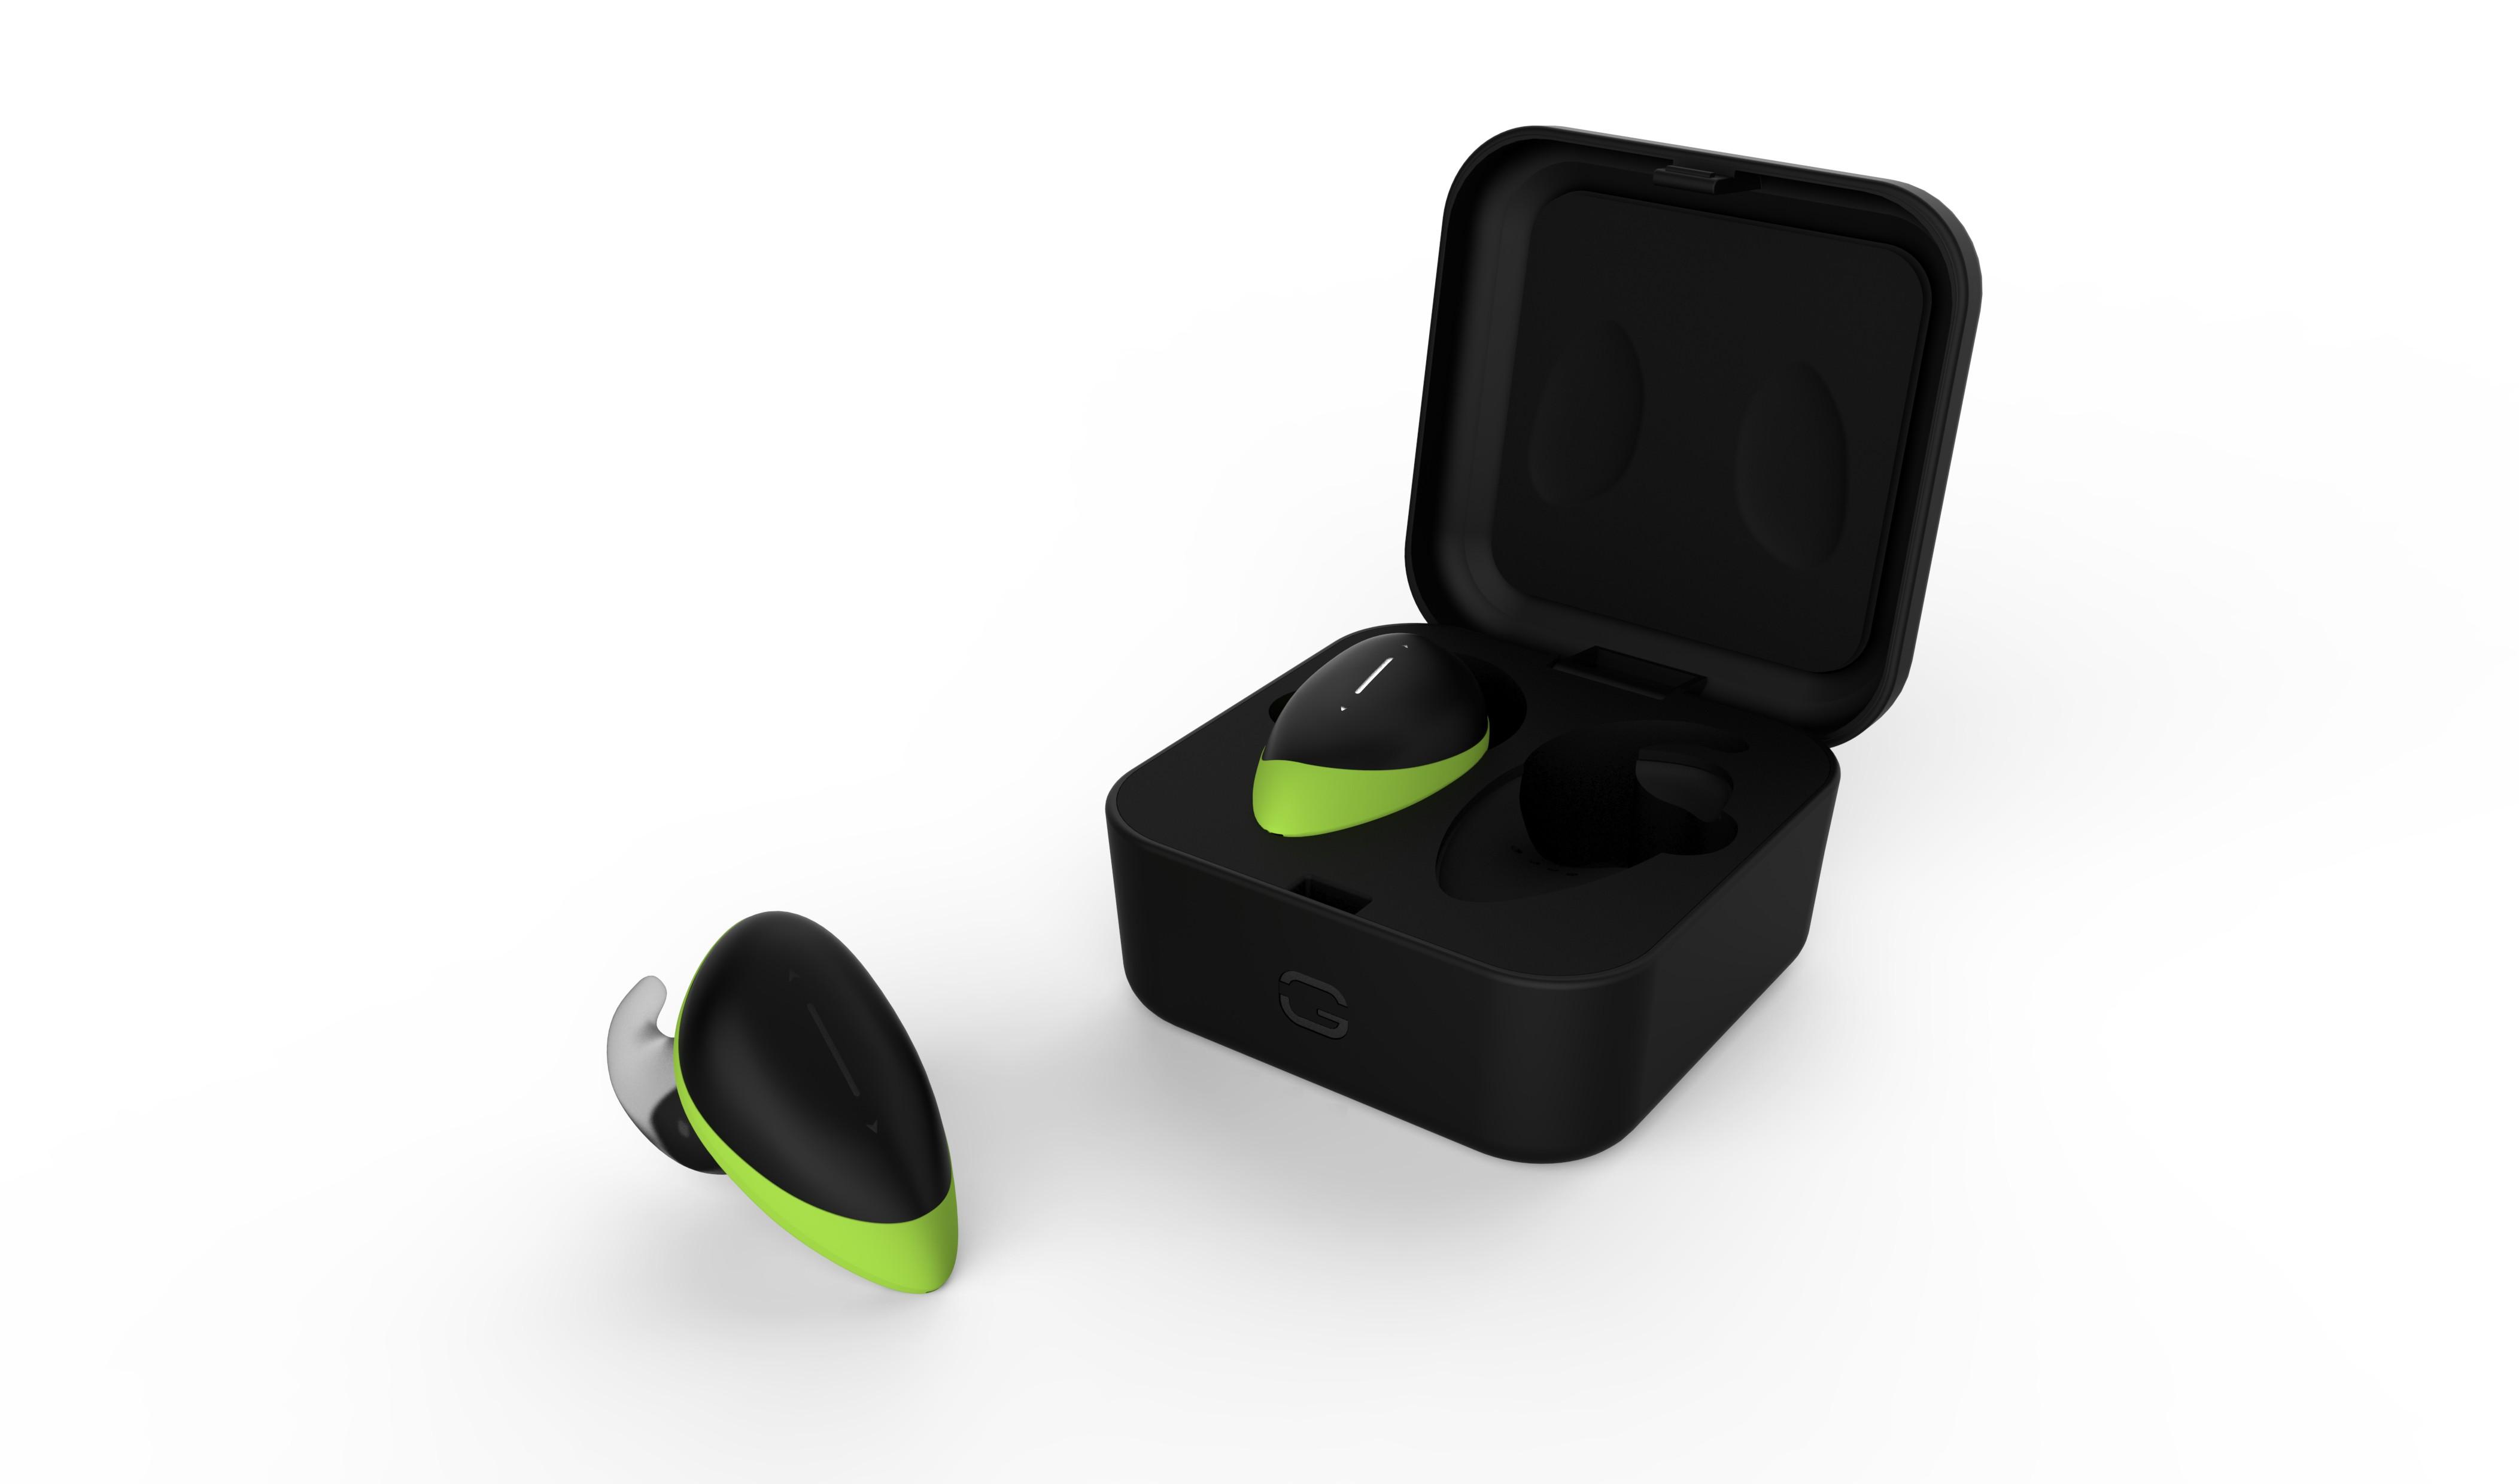 Wearables推出全球首款双耳独立的运动随身听gogo